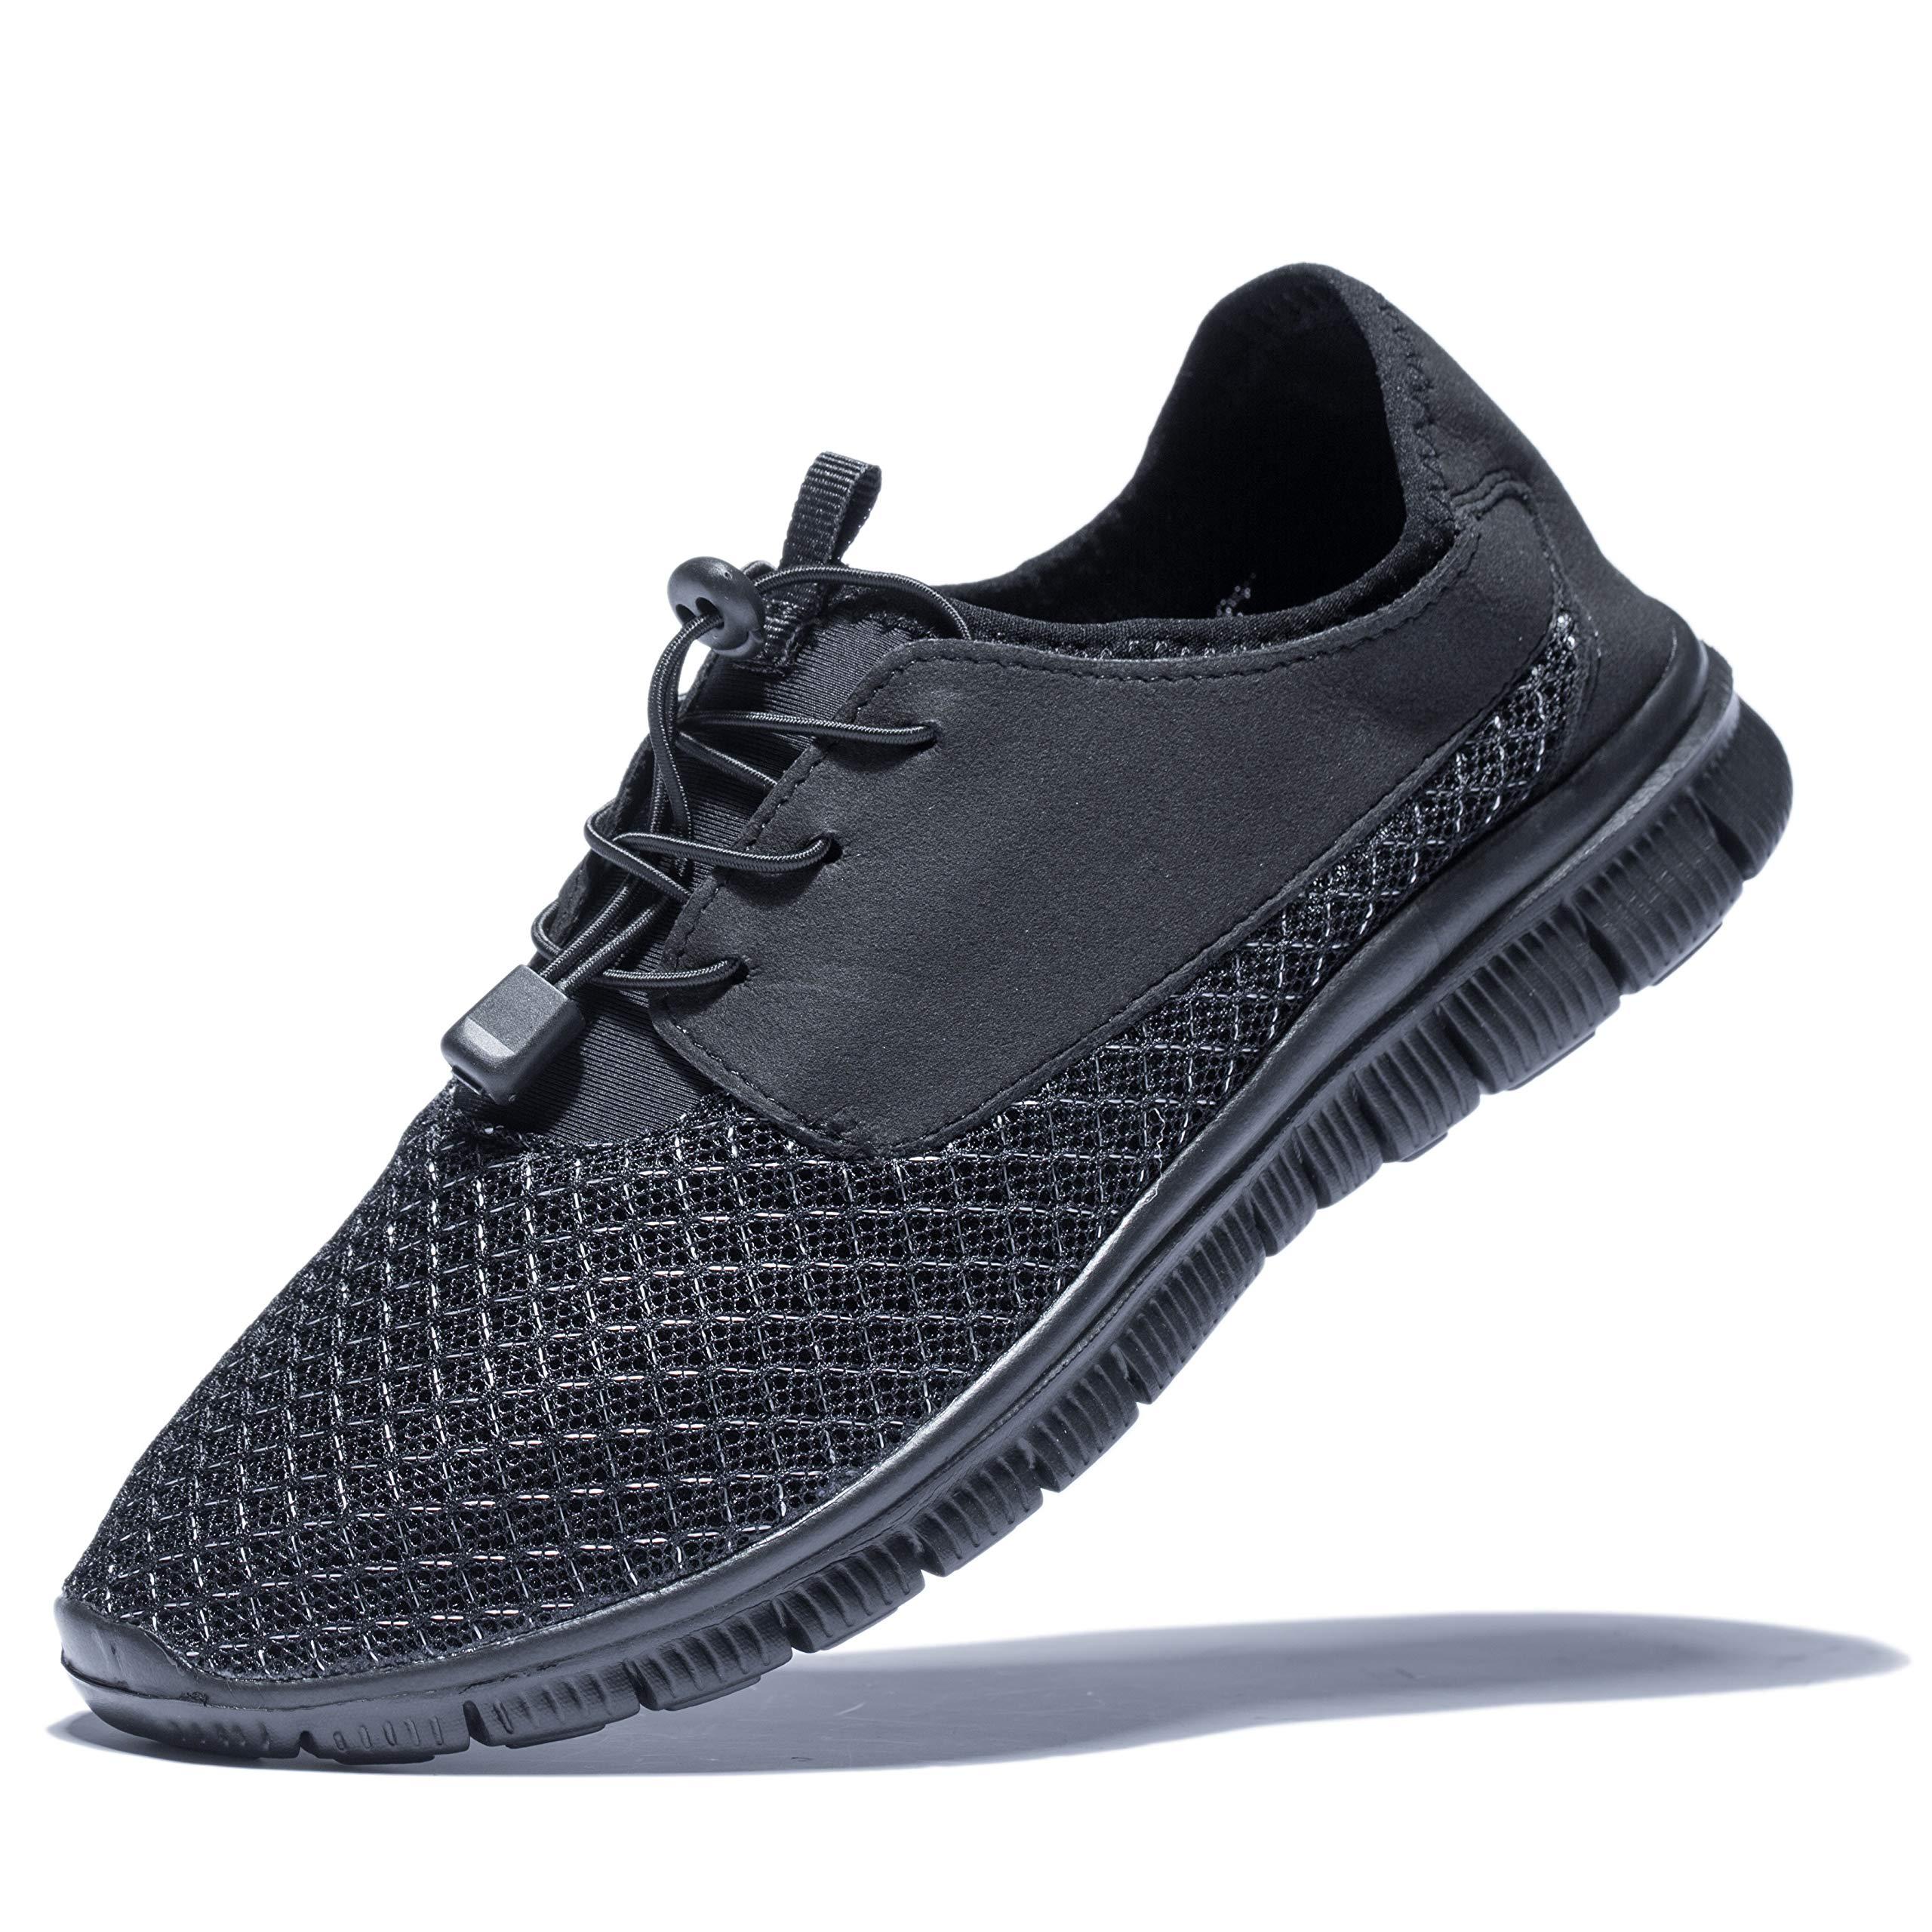 KENSBUY Men's Walking Sneakers Lightweight Mesh Lace up Shoes(Black/Black EU41) by KENSBUY (Image #1)